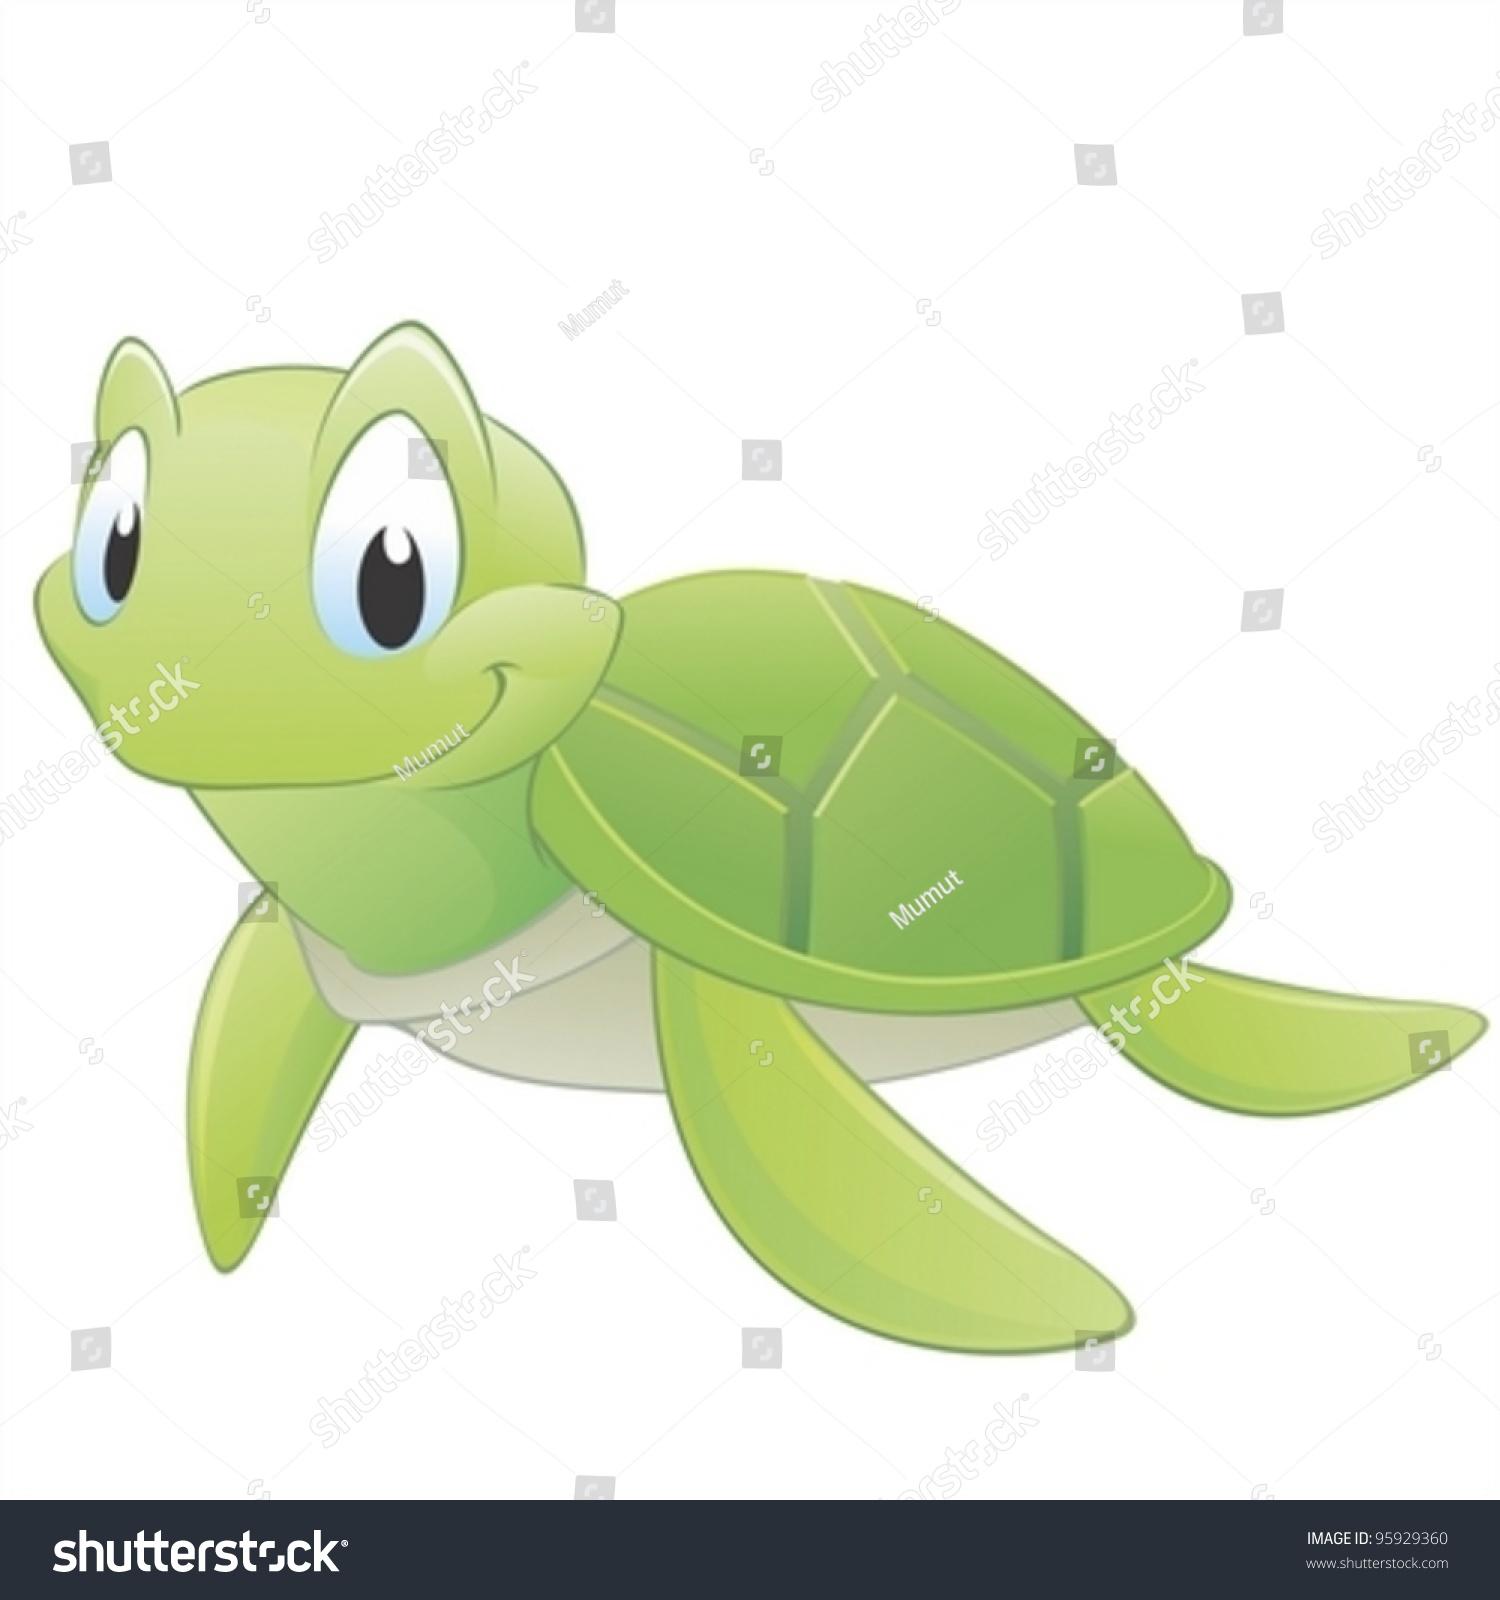 Cute cartoon turtle with big eyes - photo#11